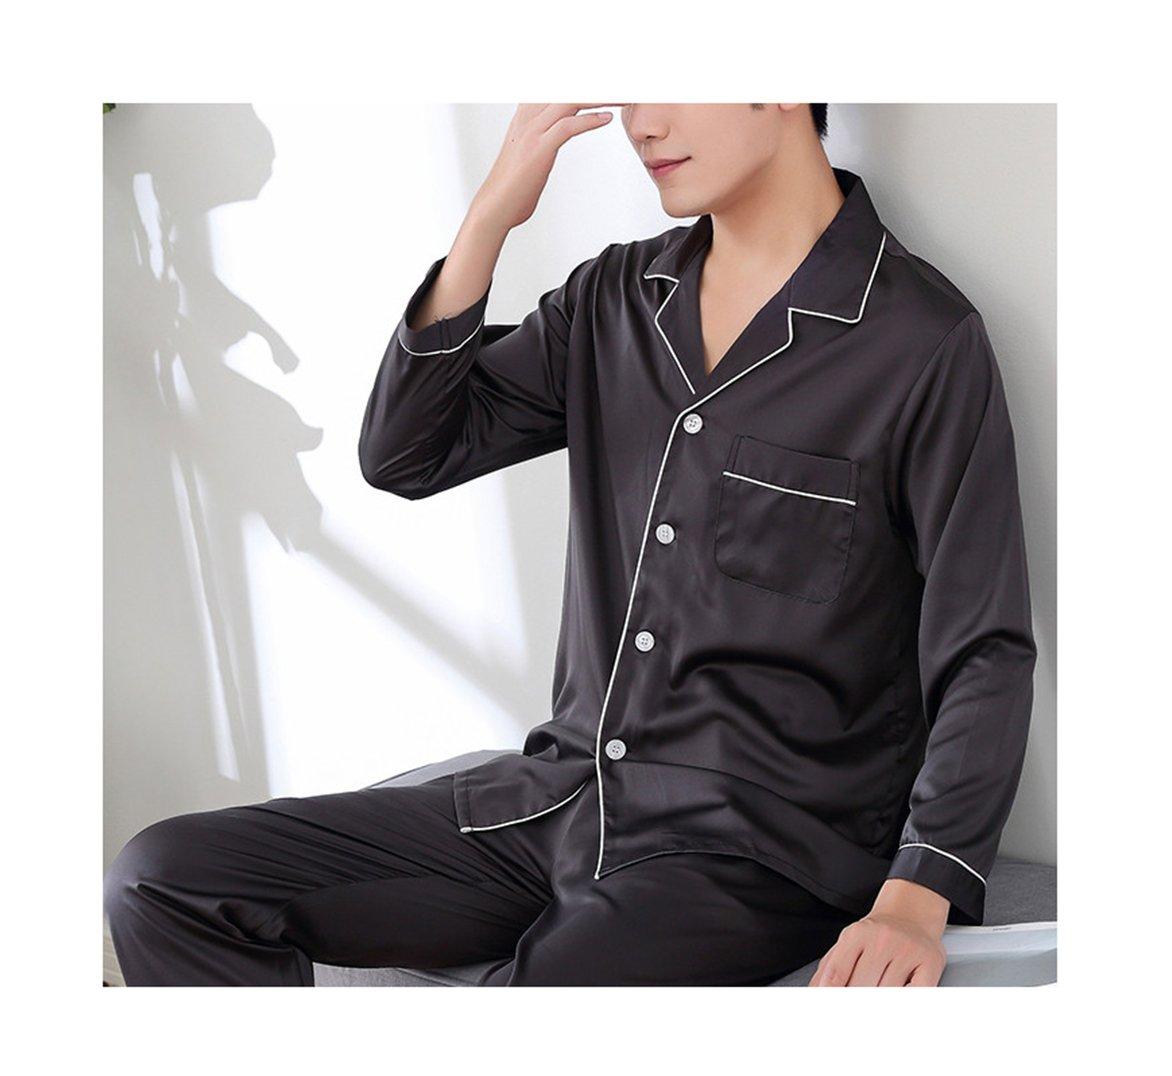 Respeedime Autumn Home Service Silk Pajamas Summer Men 's Long Sleeved Trousers Sets Sleepwear Black-Gray Size L